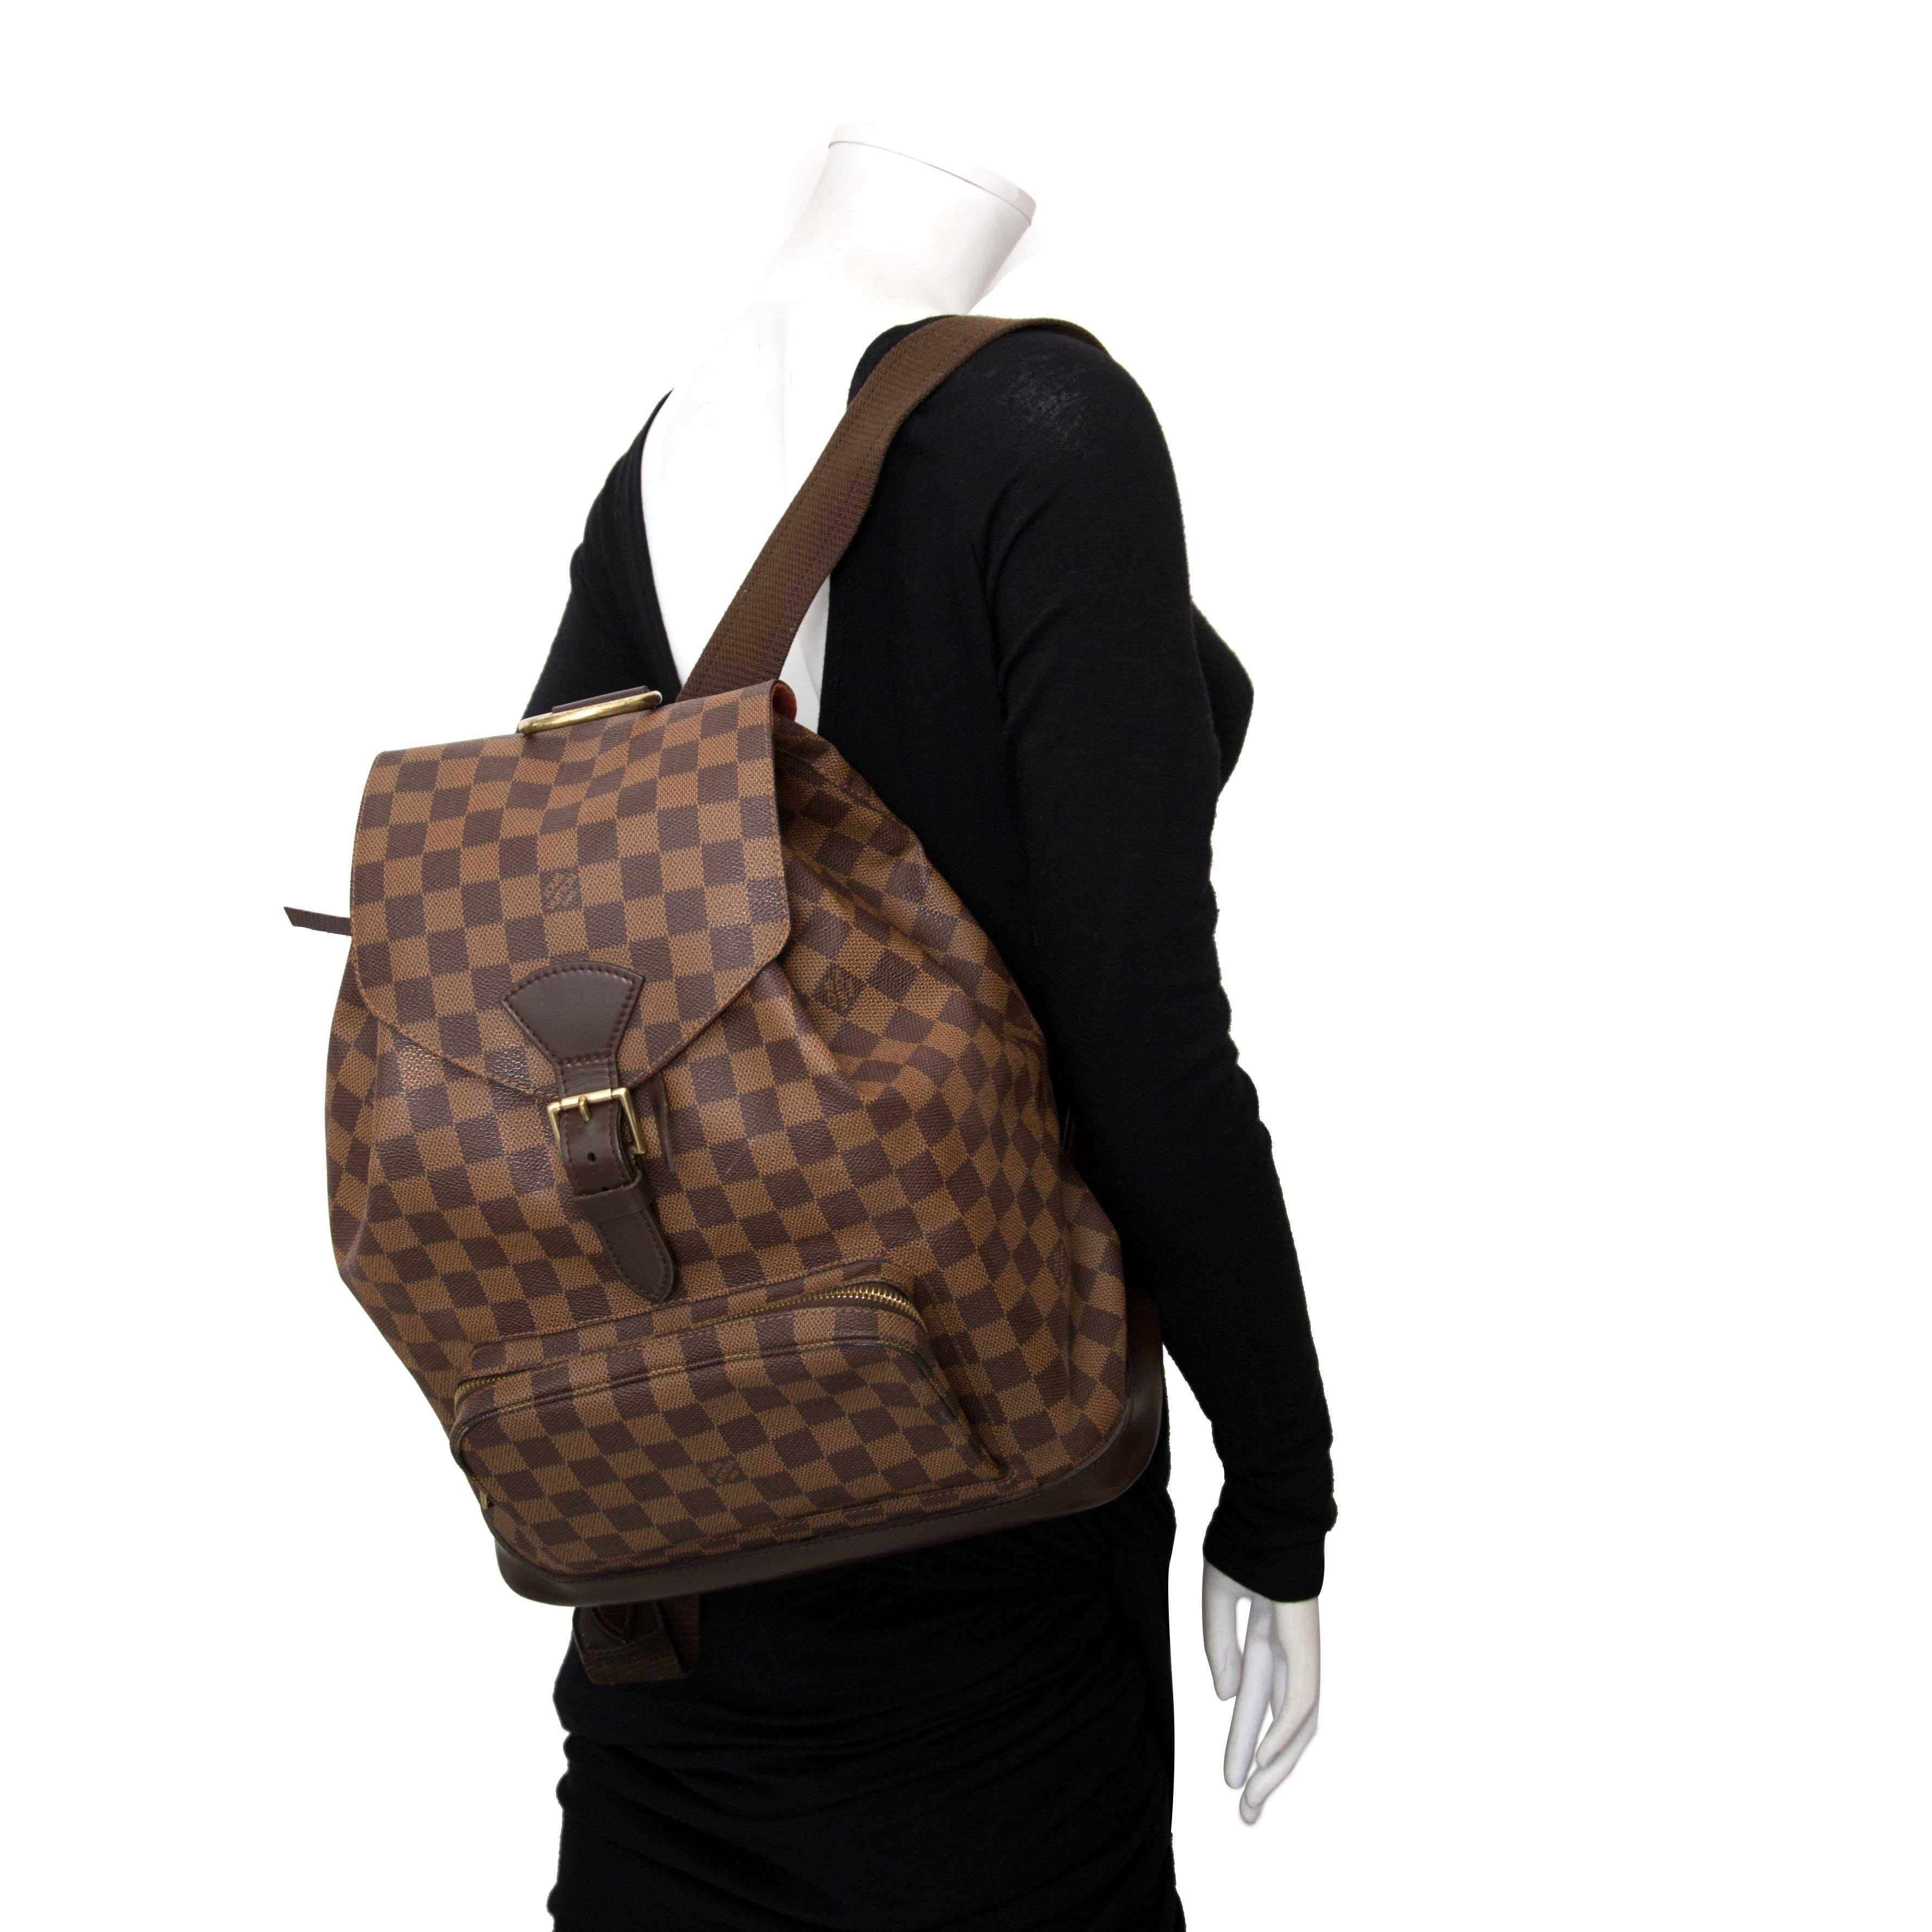 b1f5c04c2aaf Louis Vuitton Damier Ebene Montsouris MM Backpack Bag at 1stdibs